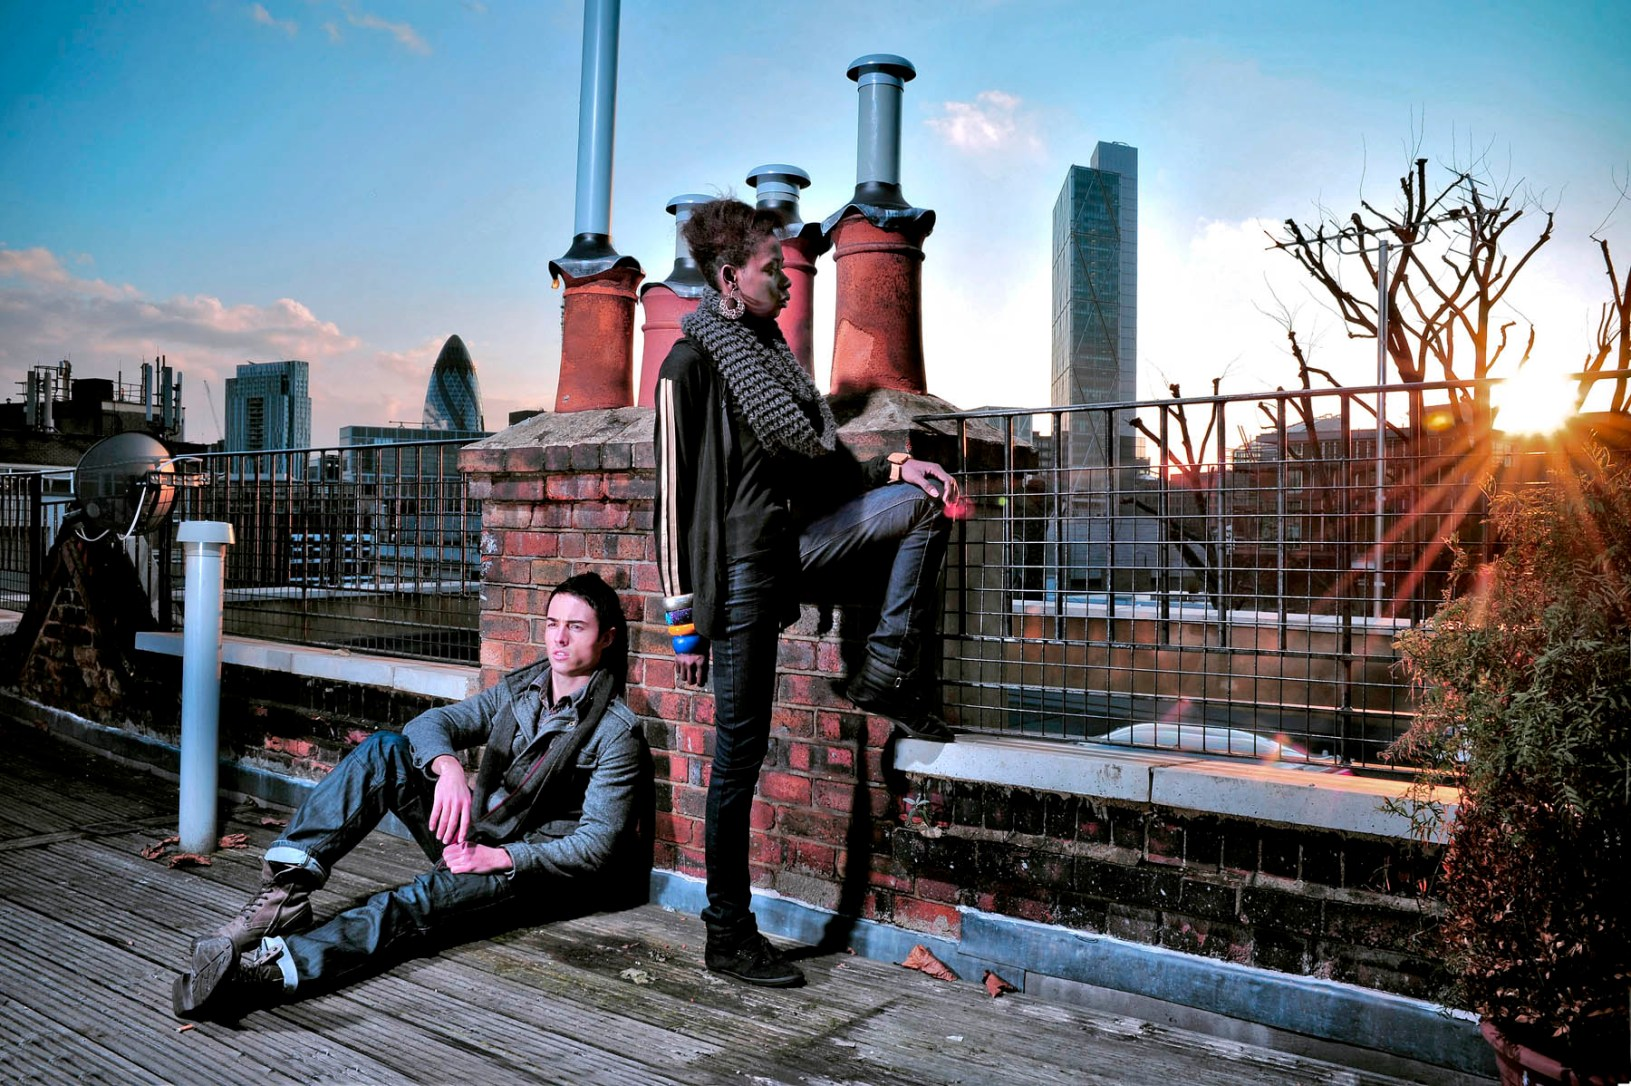 musician_artist_promo_photographer_london (37)